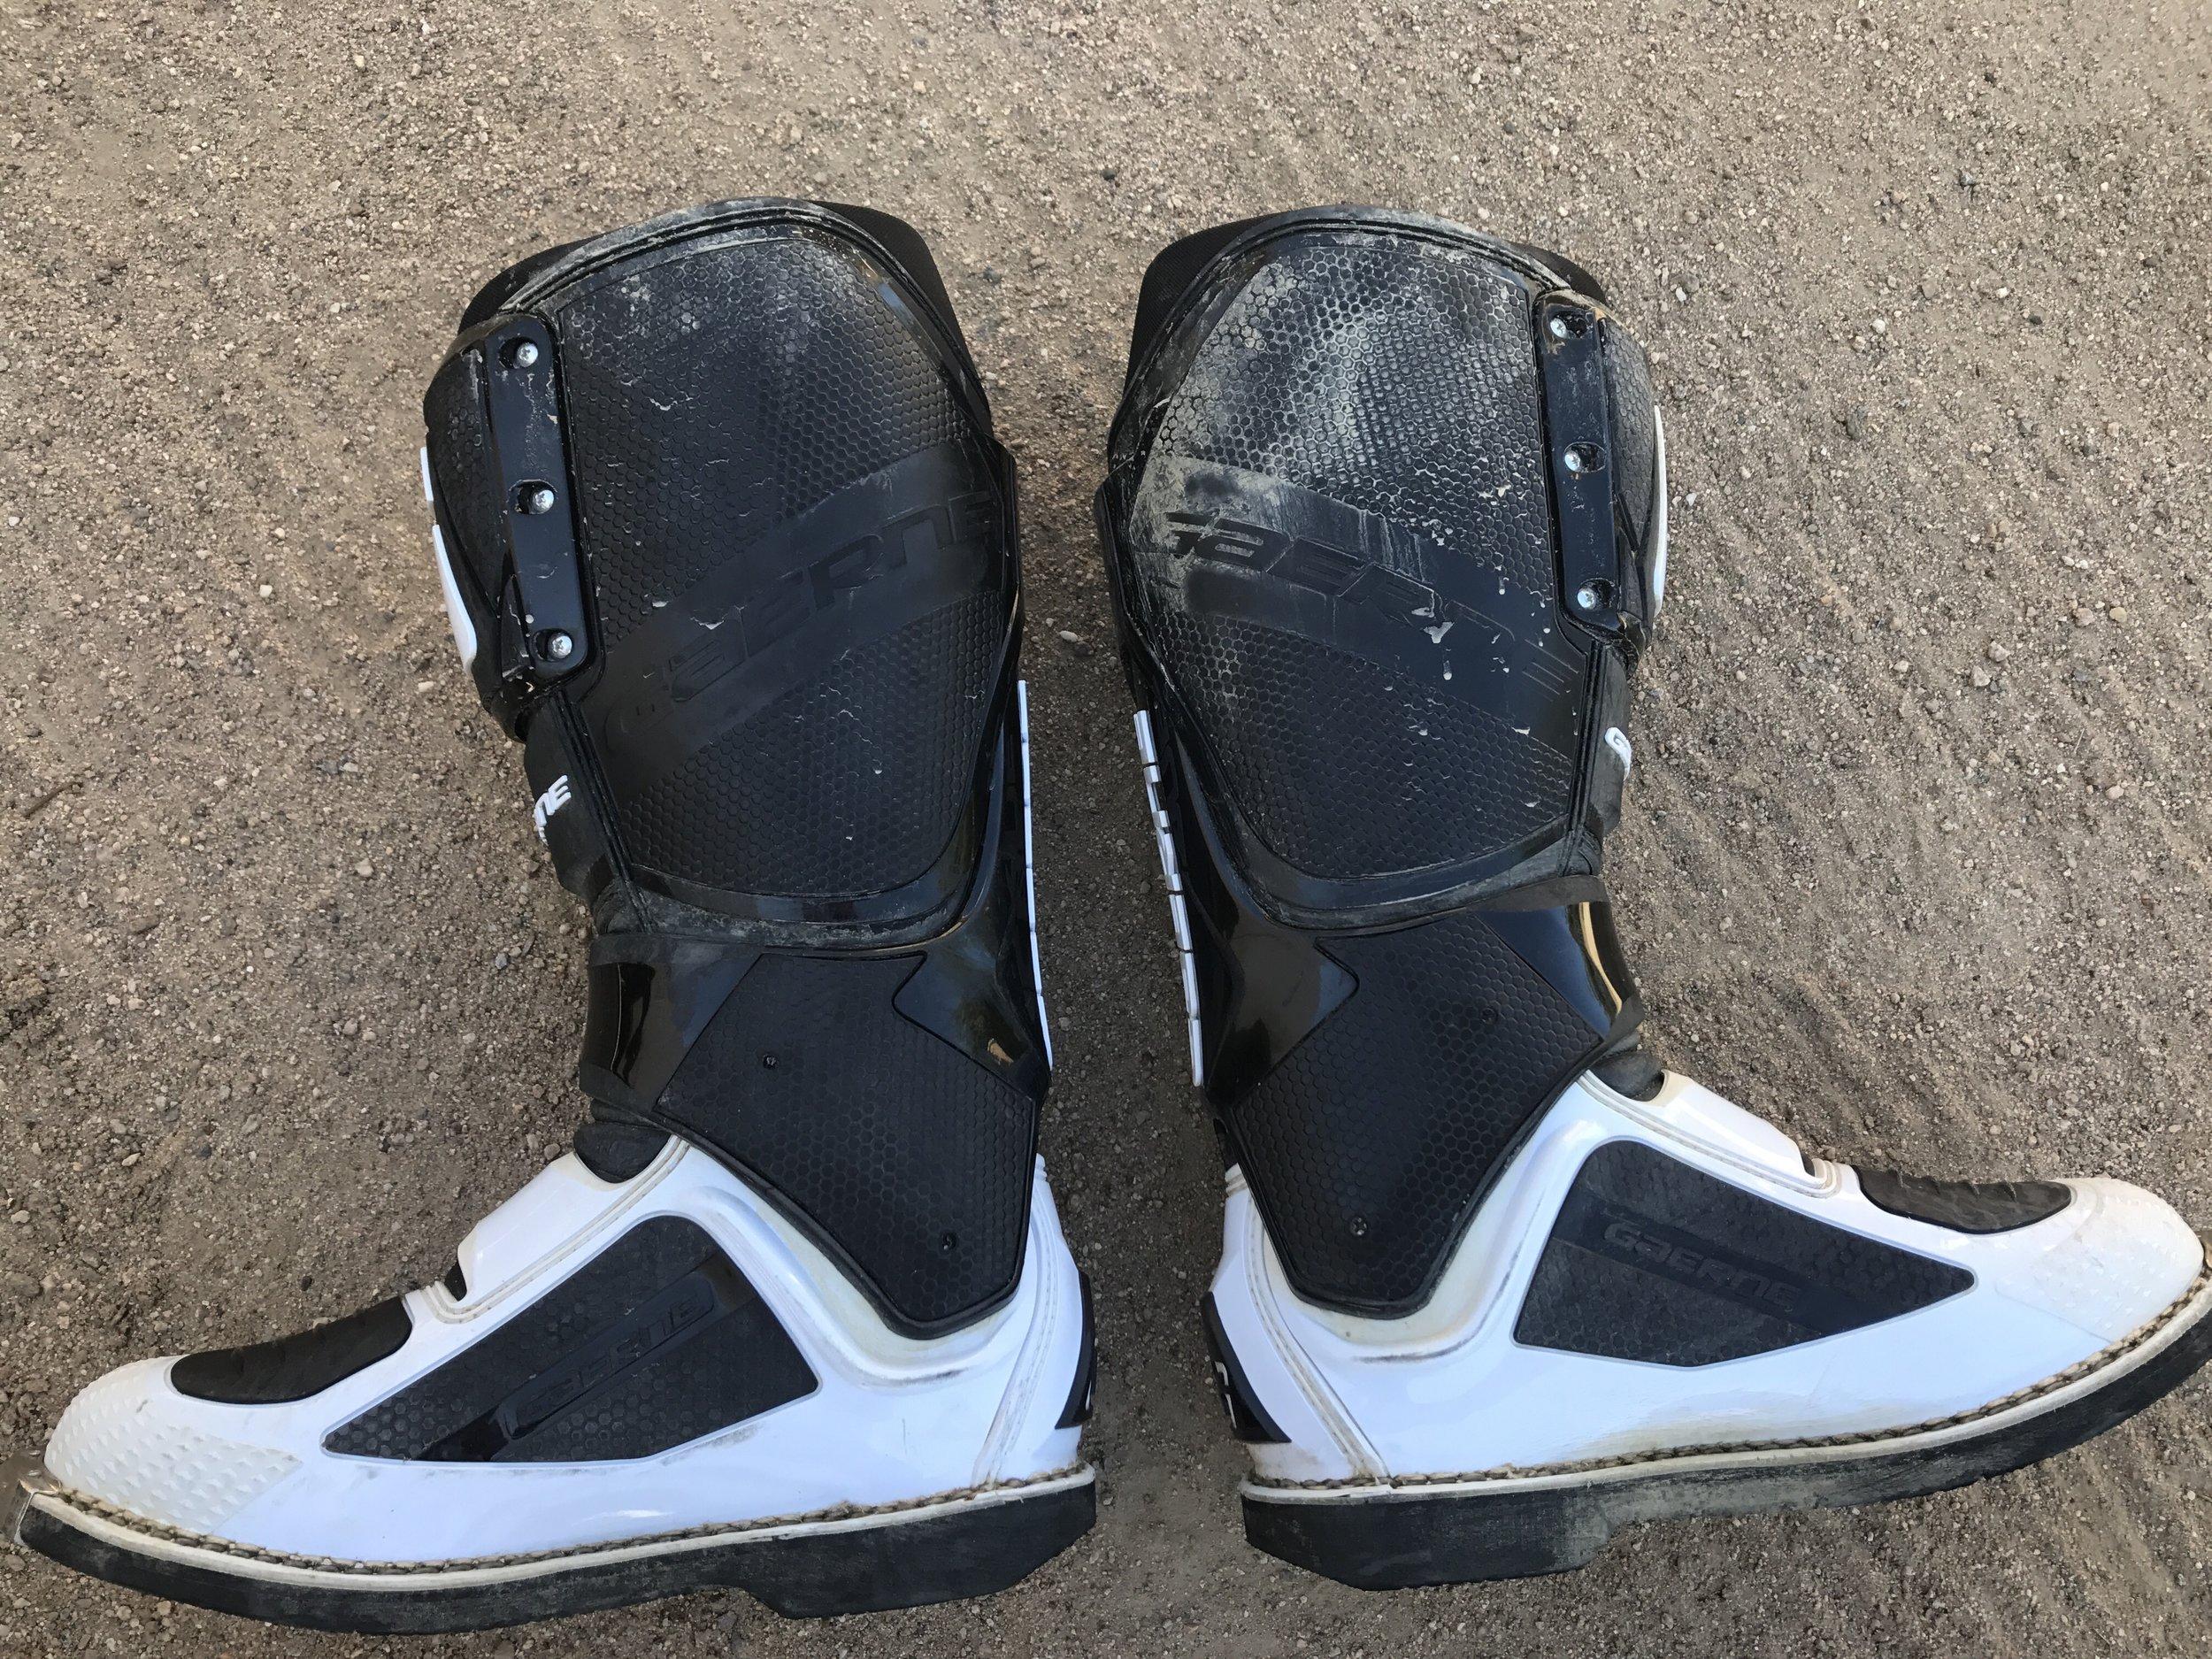 Gaerne Sg IncTesting � Boots keefer 12 ZwOPkX0N8n